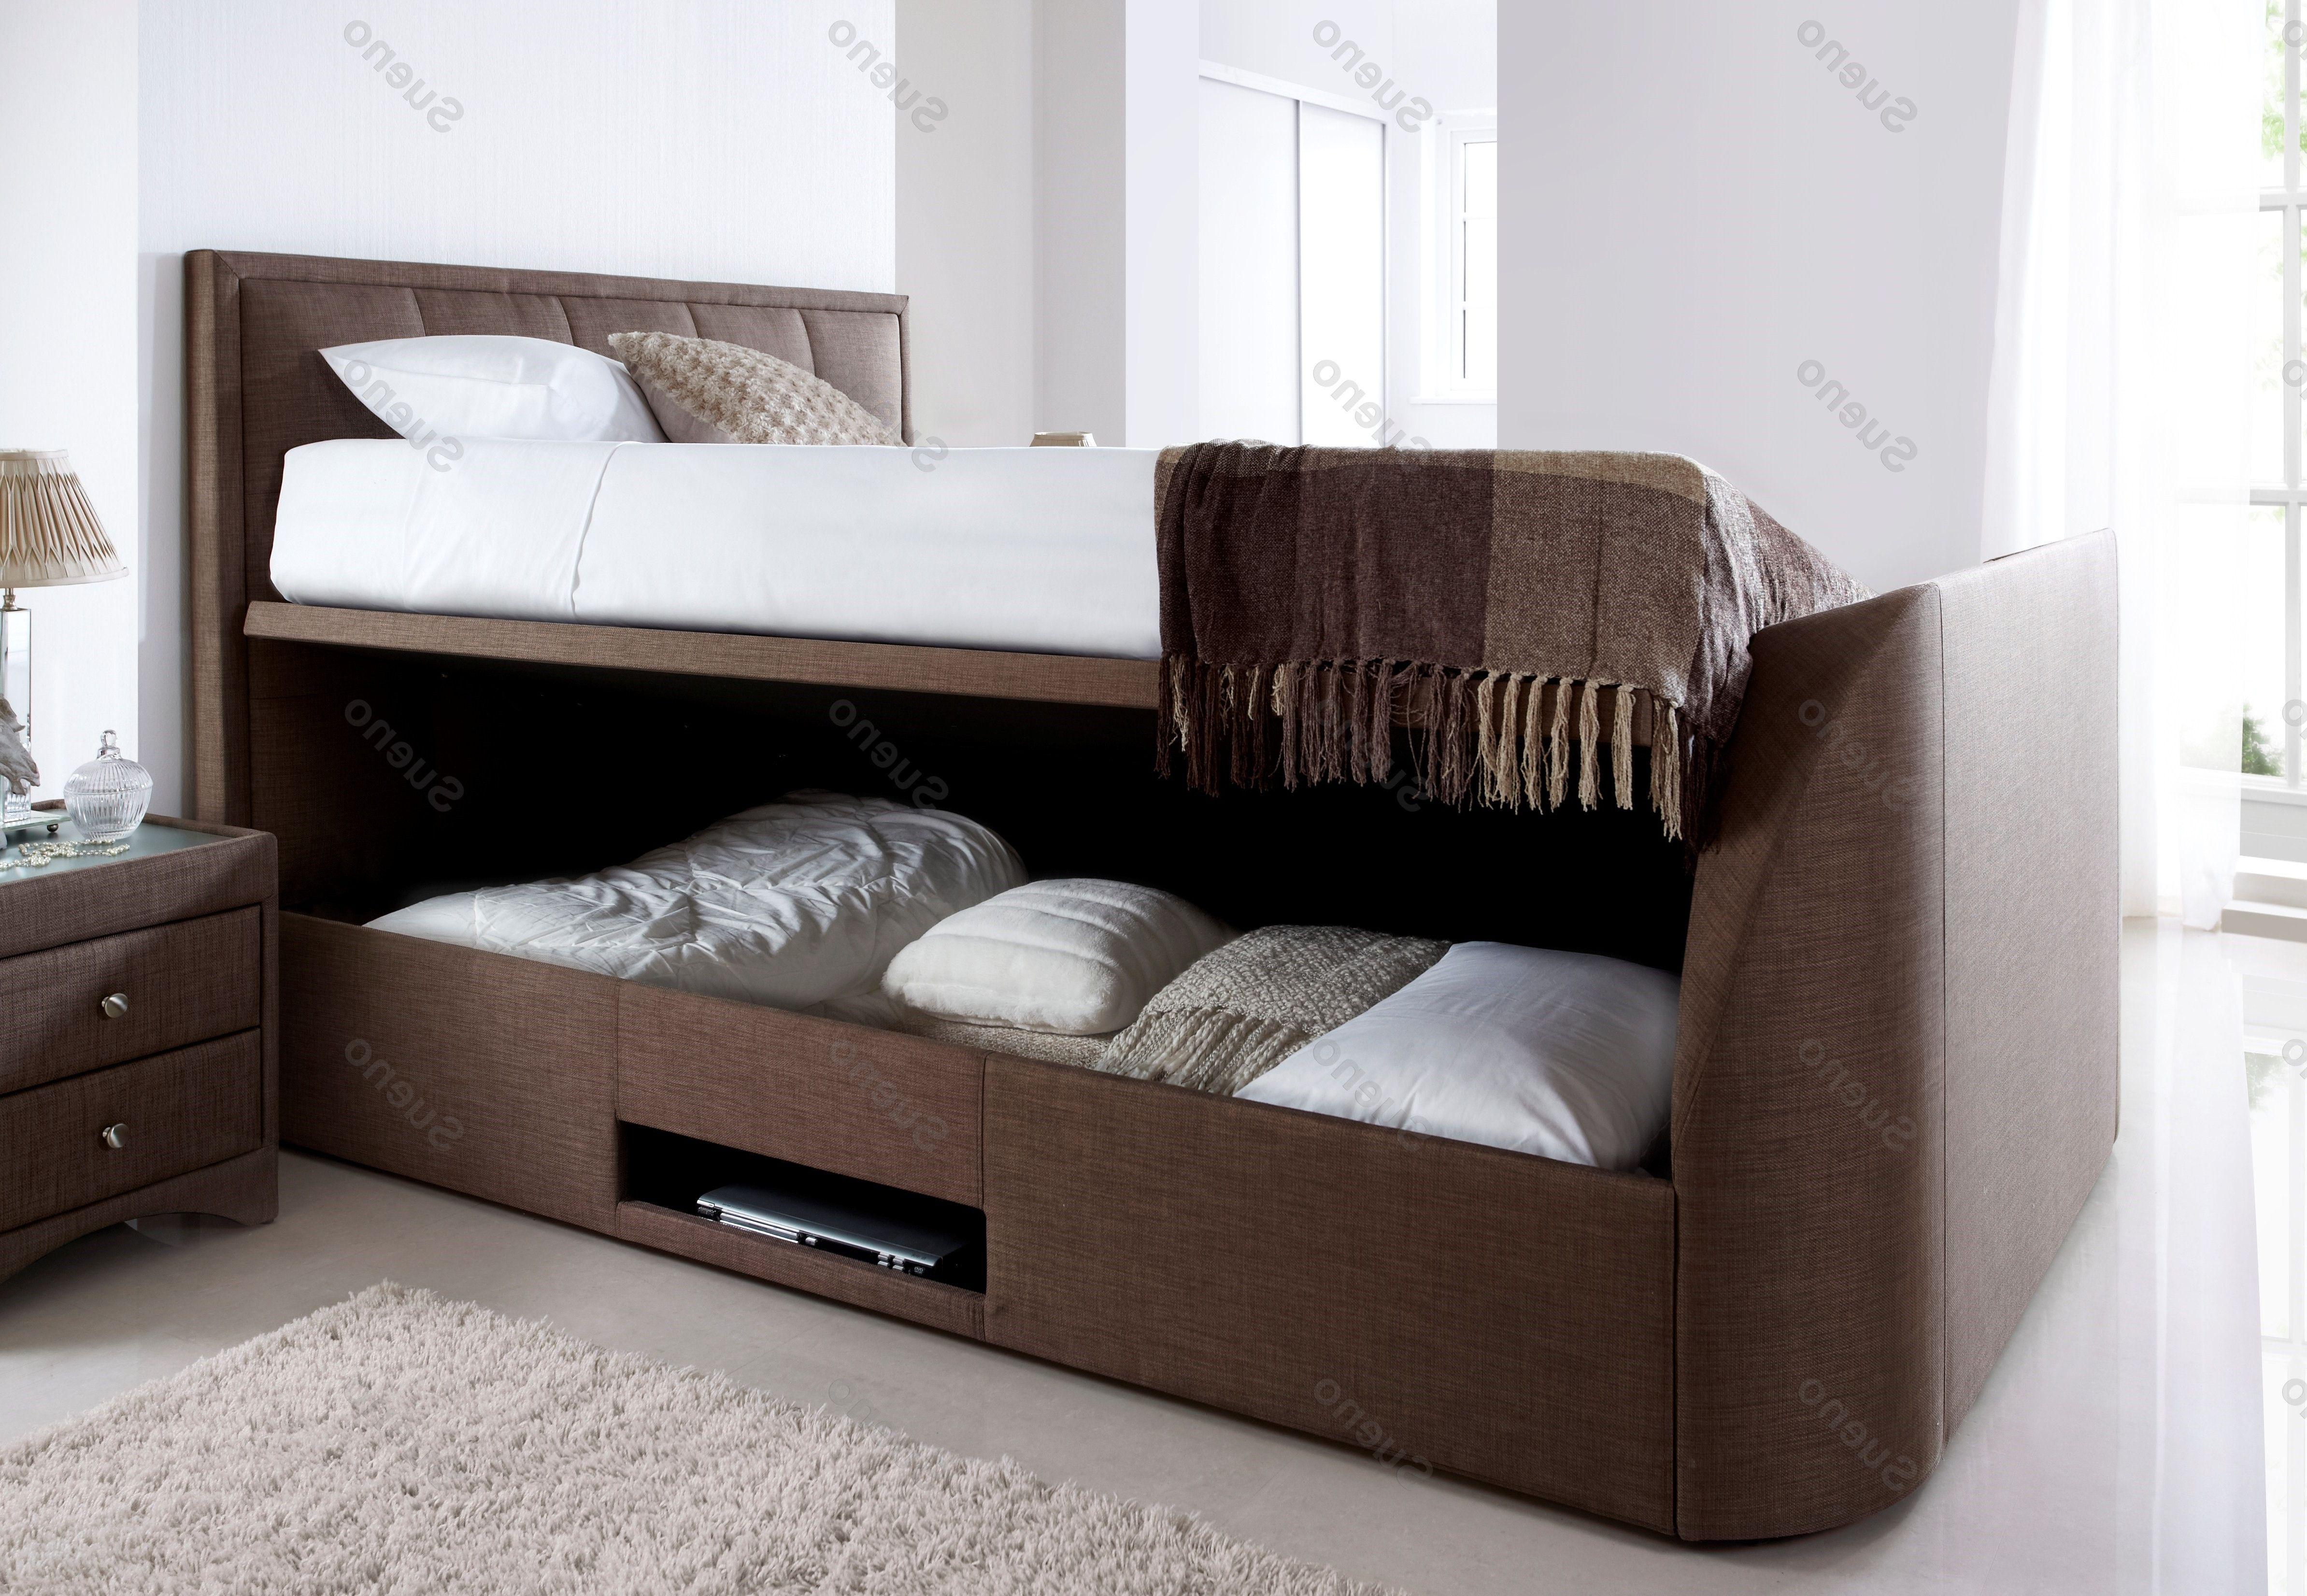 unique design of king size kaydian windemere bed for master bedroom